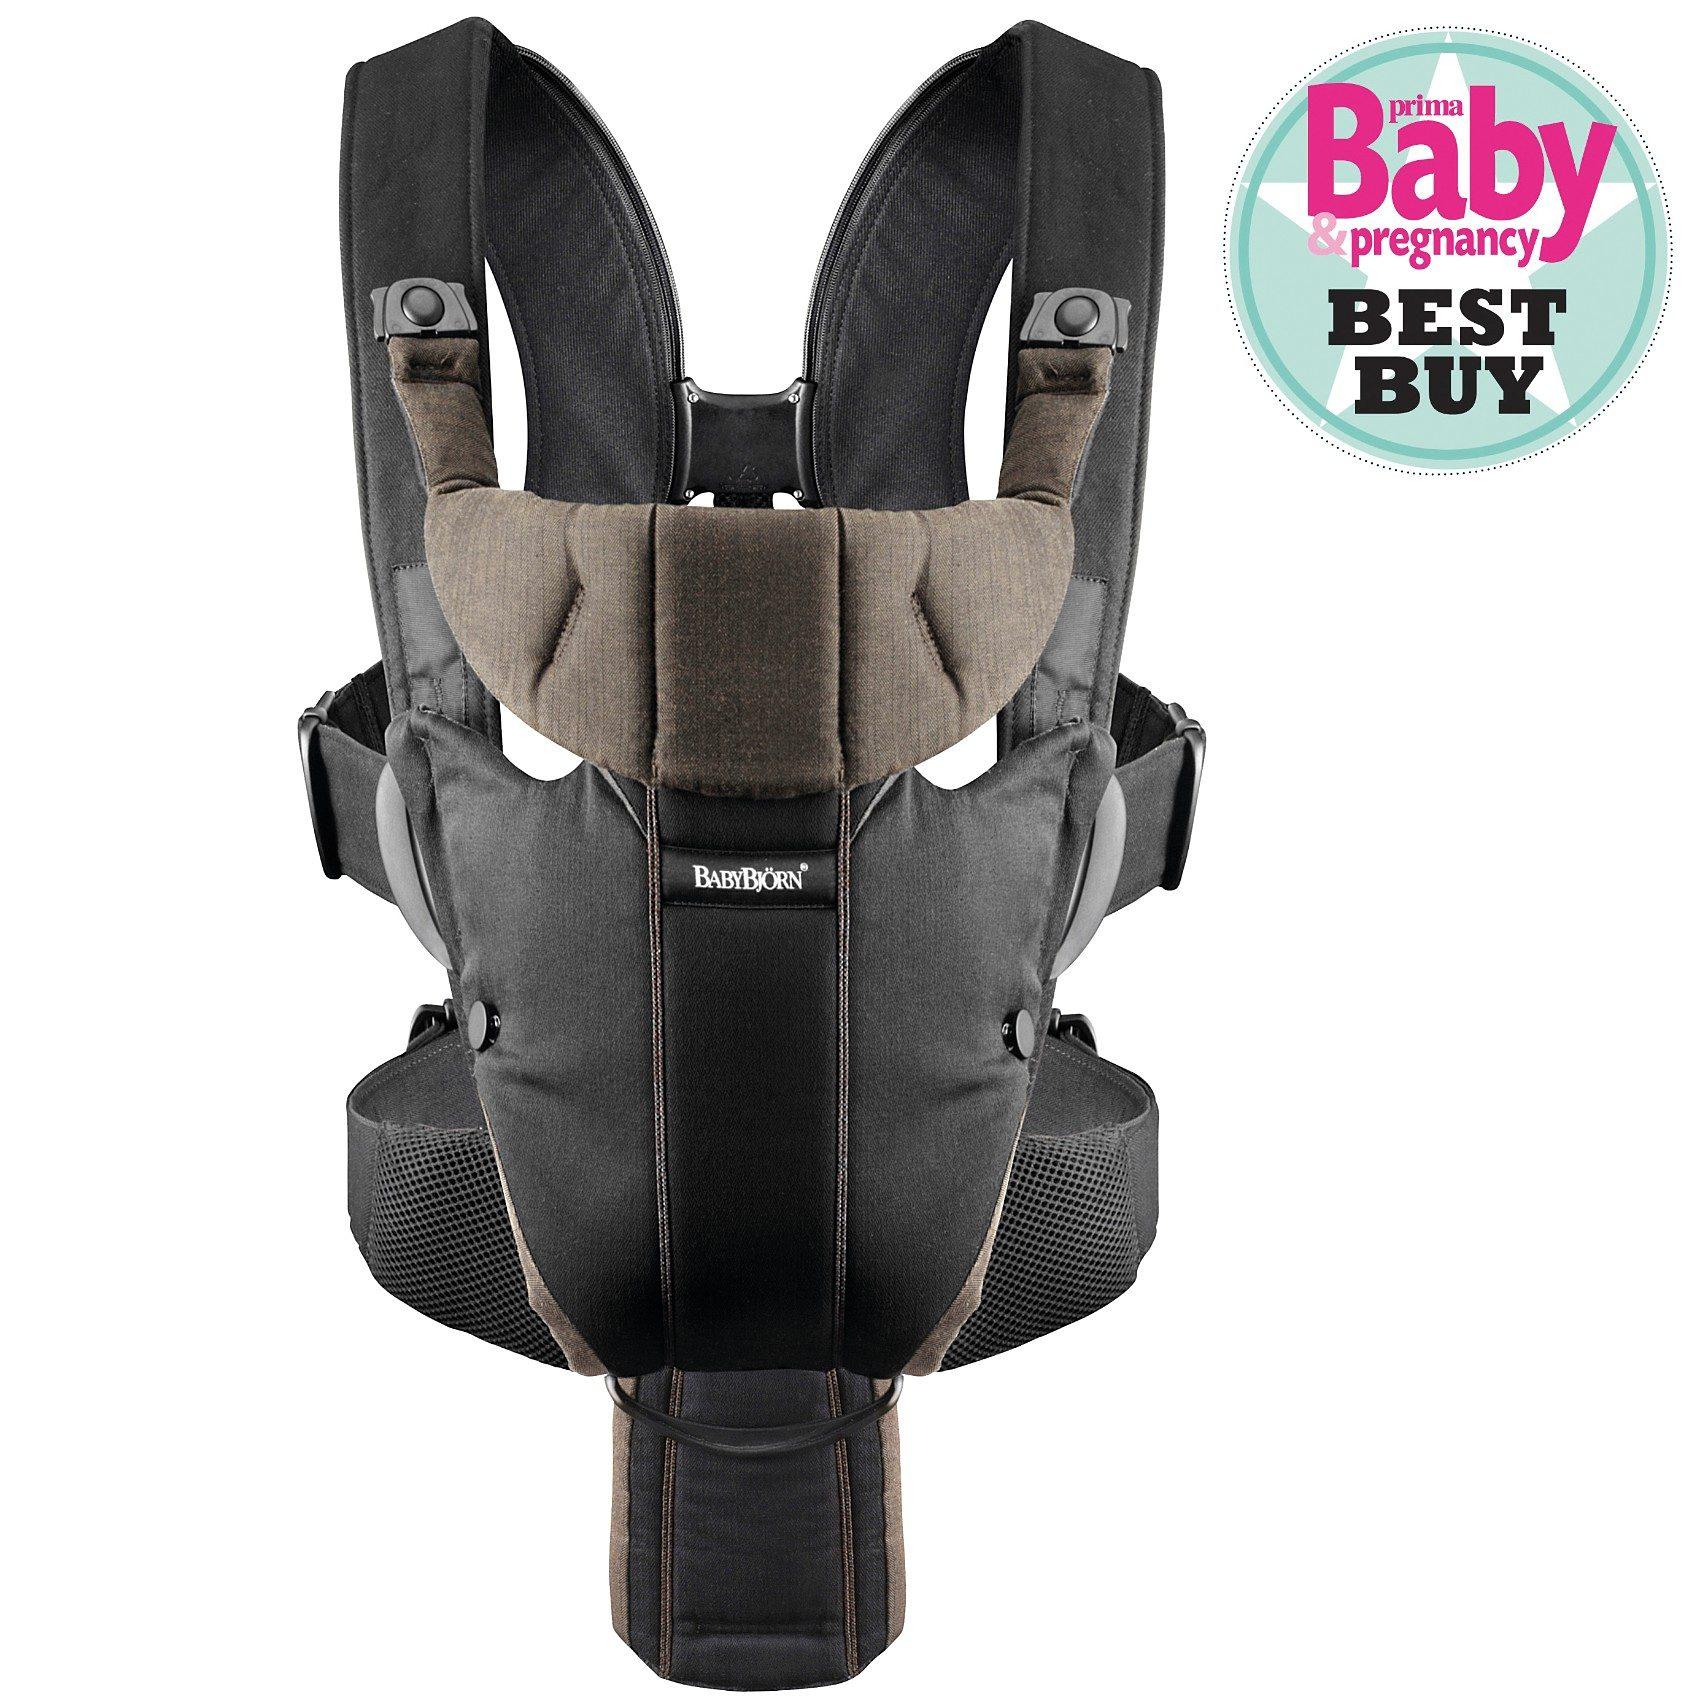 BabyBjörn Babytrage Miracle, schwarz/braun, Organic